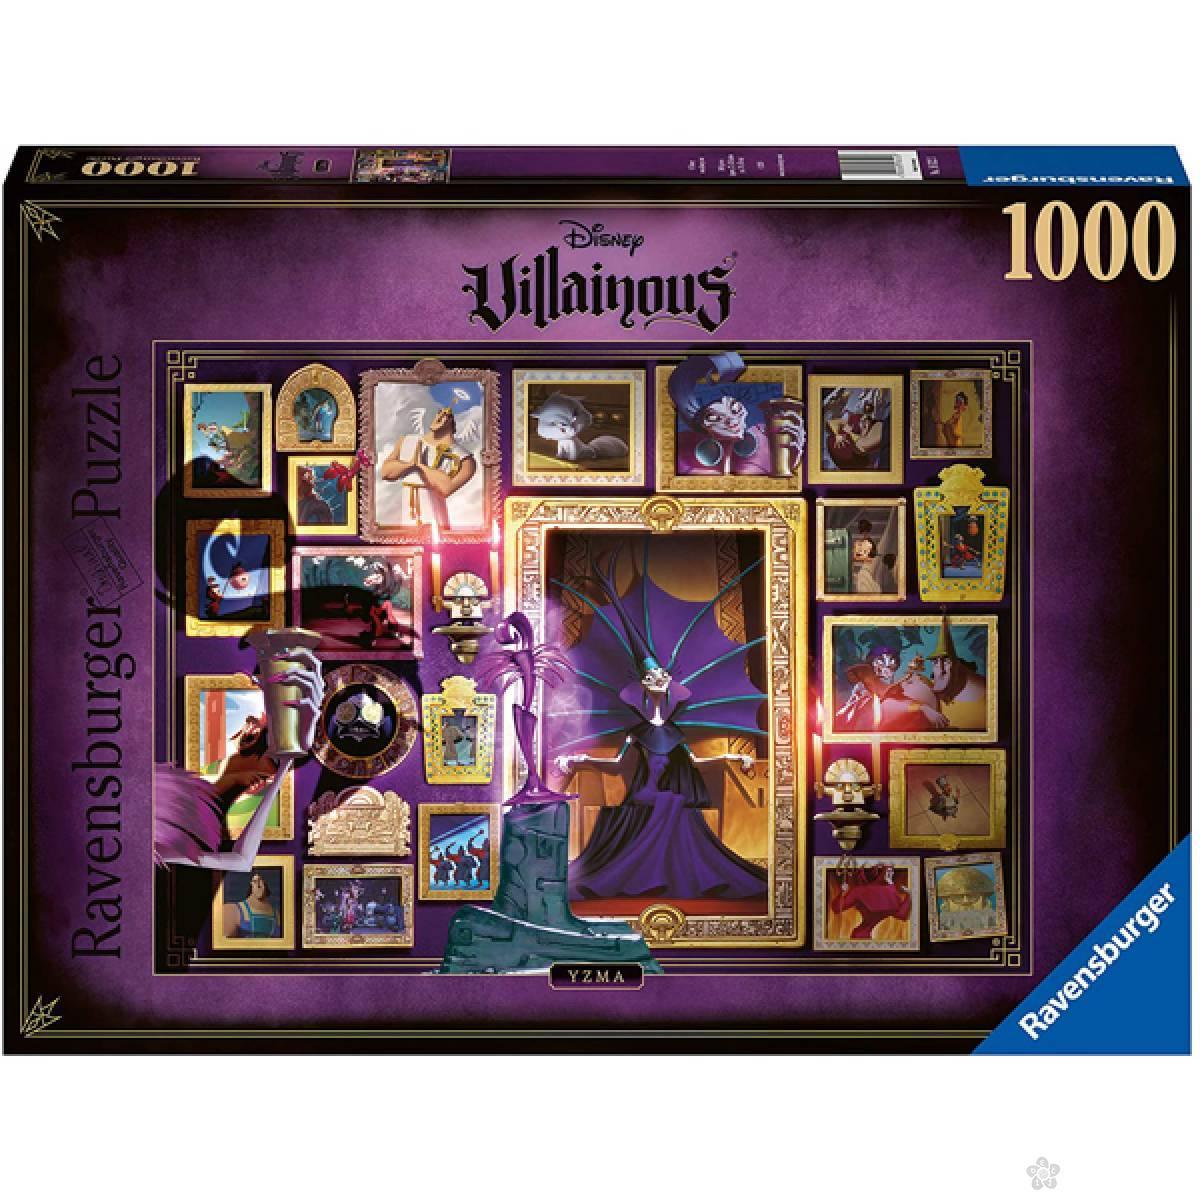 Ravensburger puzzle Villainous - Yzma RA16522